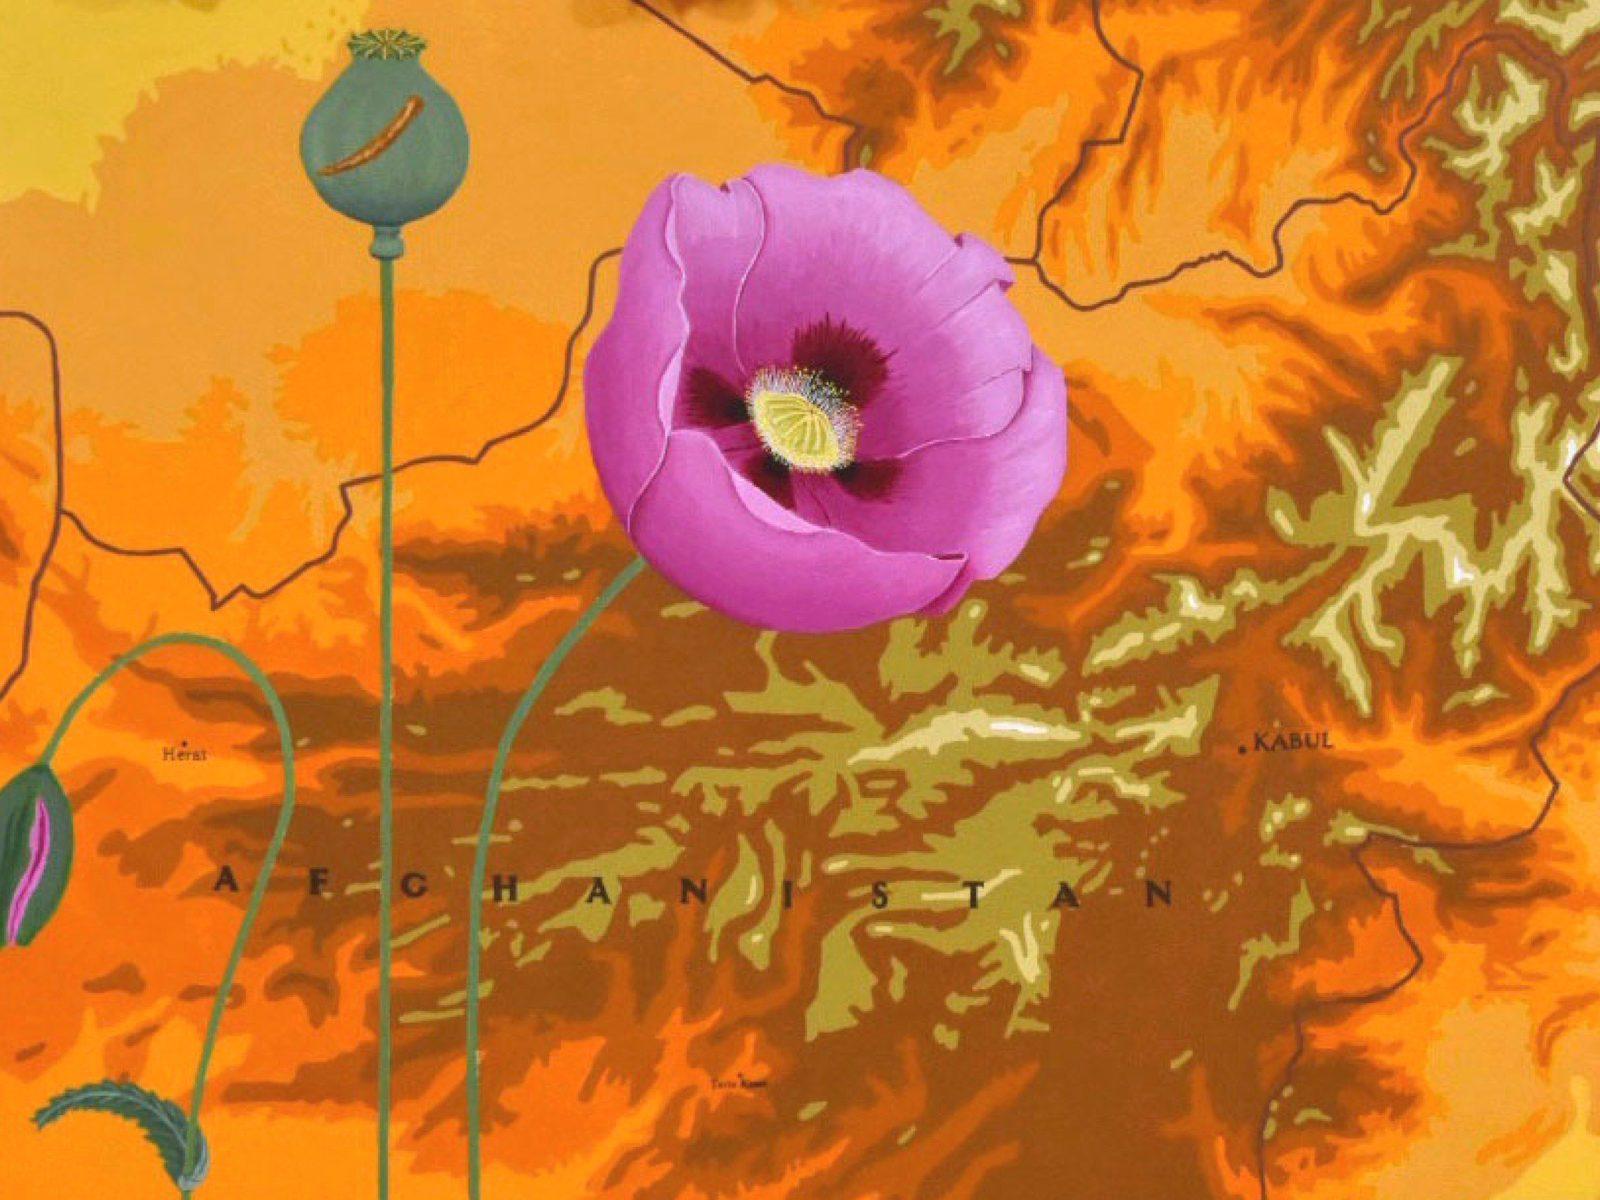 Geoffrey Jones - Lament for Afghanistan (Detail)